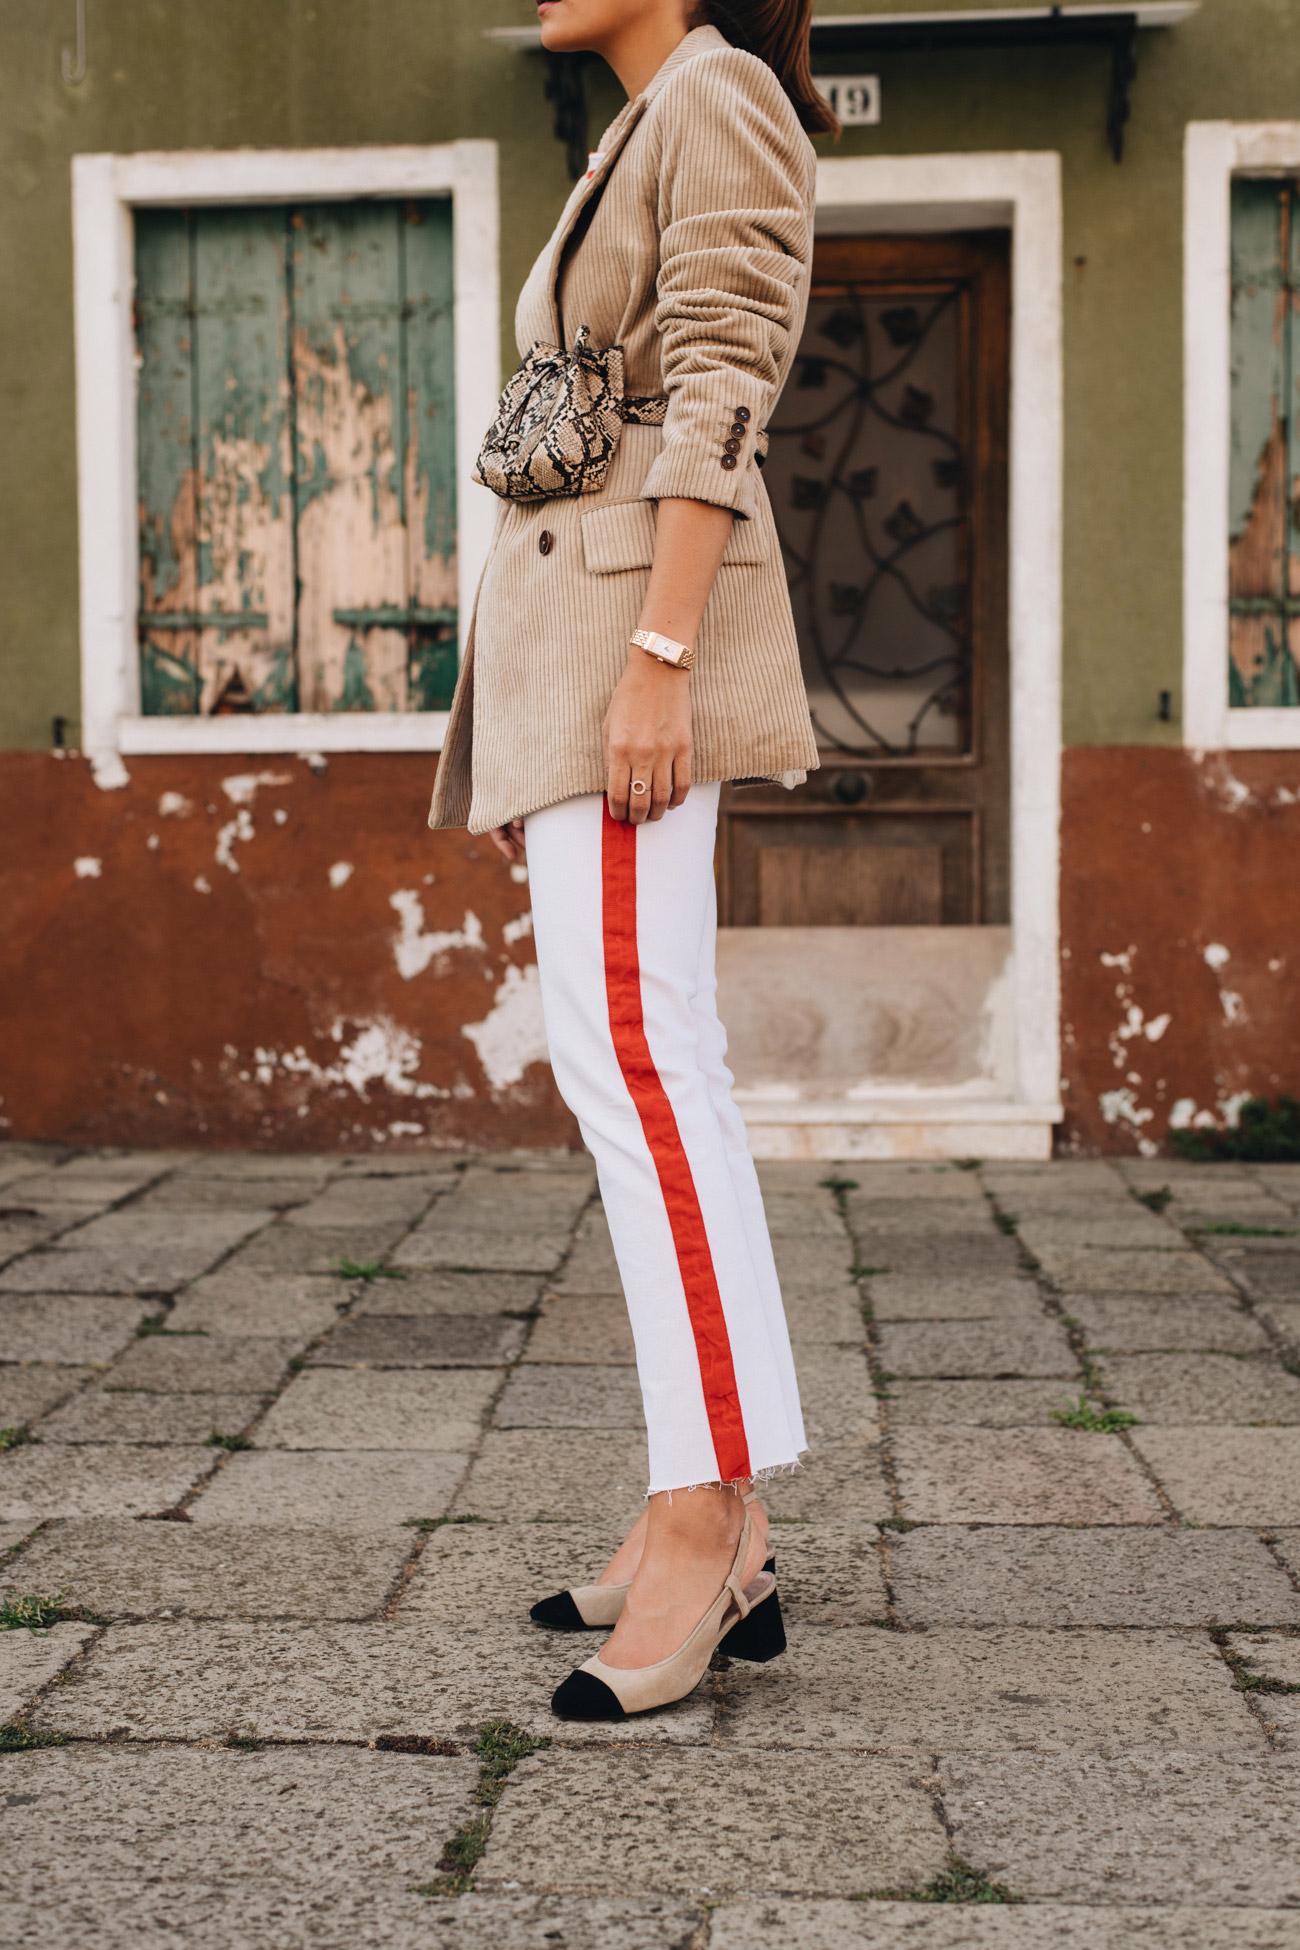 Hosenmodelle für Frauen